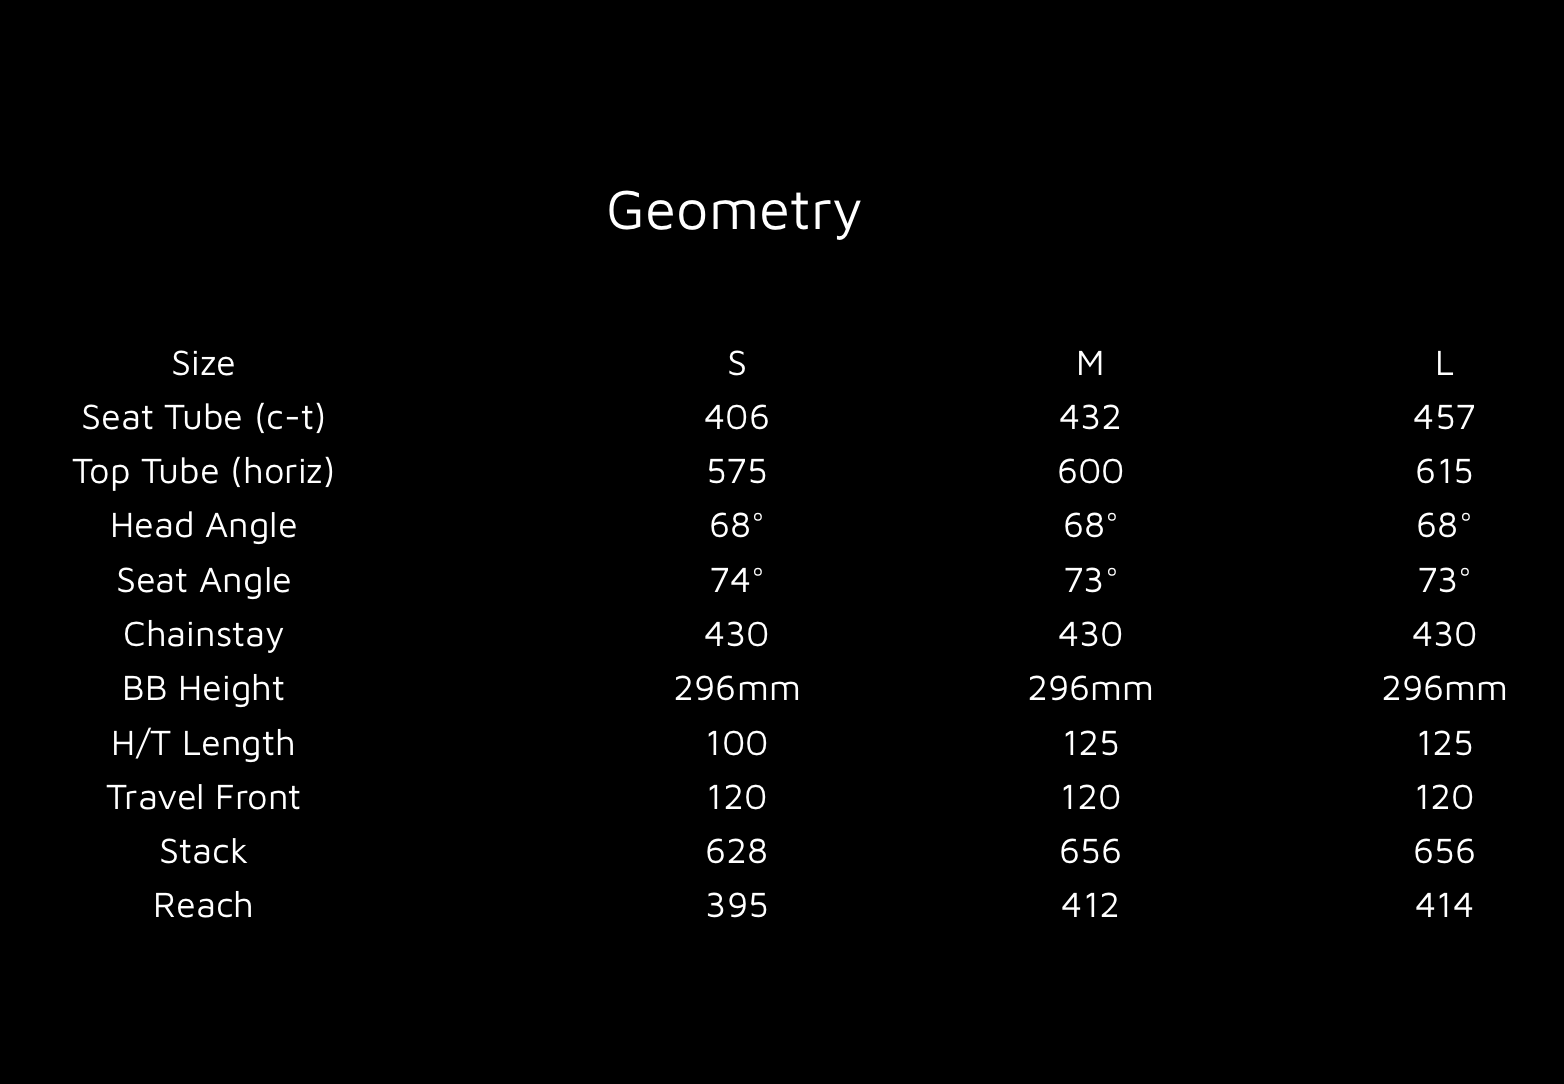 2017 Bruzza Geometry .png